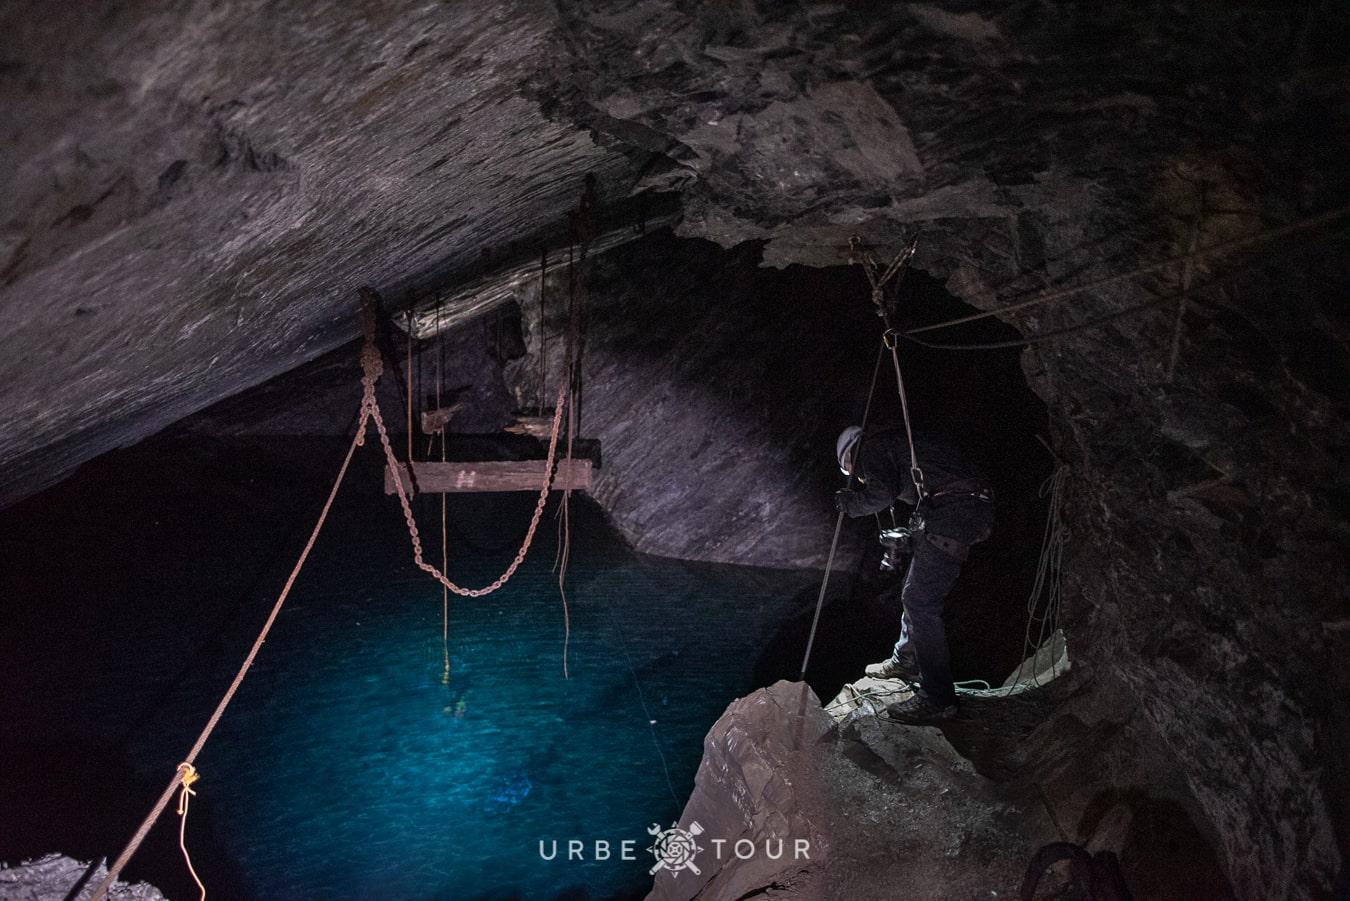 urbextour abandoned mines in snowdonia